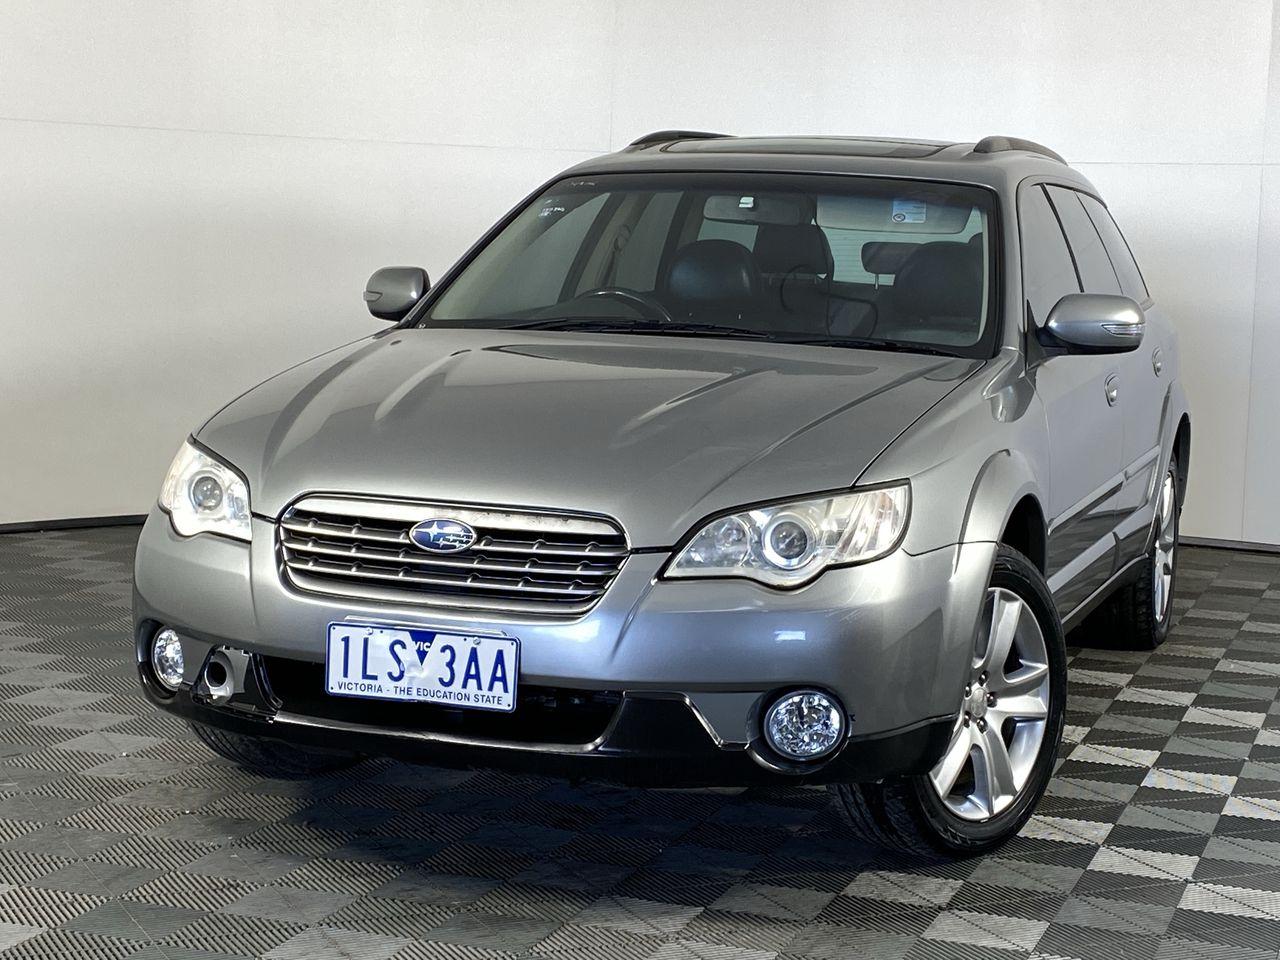 2007 Subaru Outback Automatic SUV (WOVR Inspected)